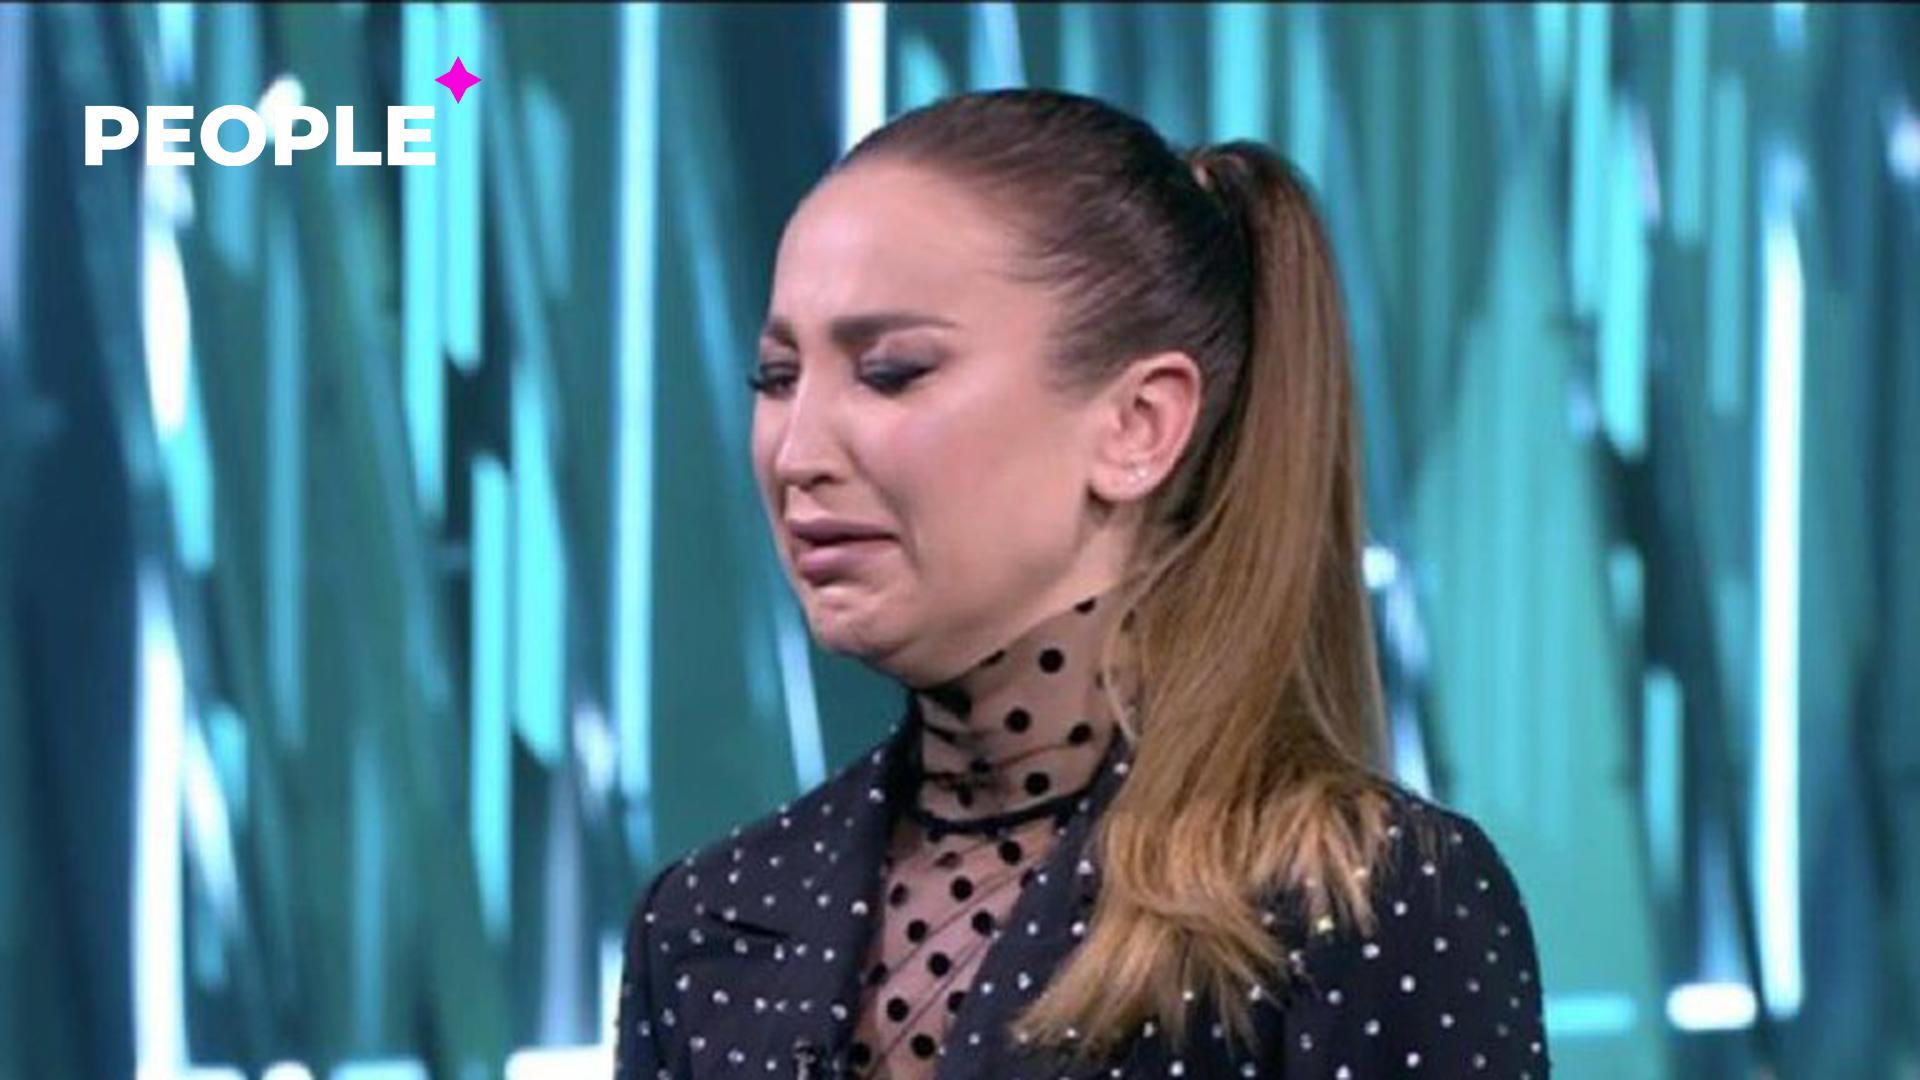 Тина Канделаки заявила, что Бузова пришла на «МАТЧ-ТВ» в нетрезвом состоянии